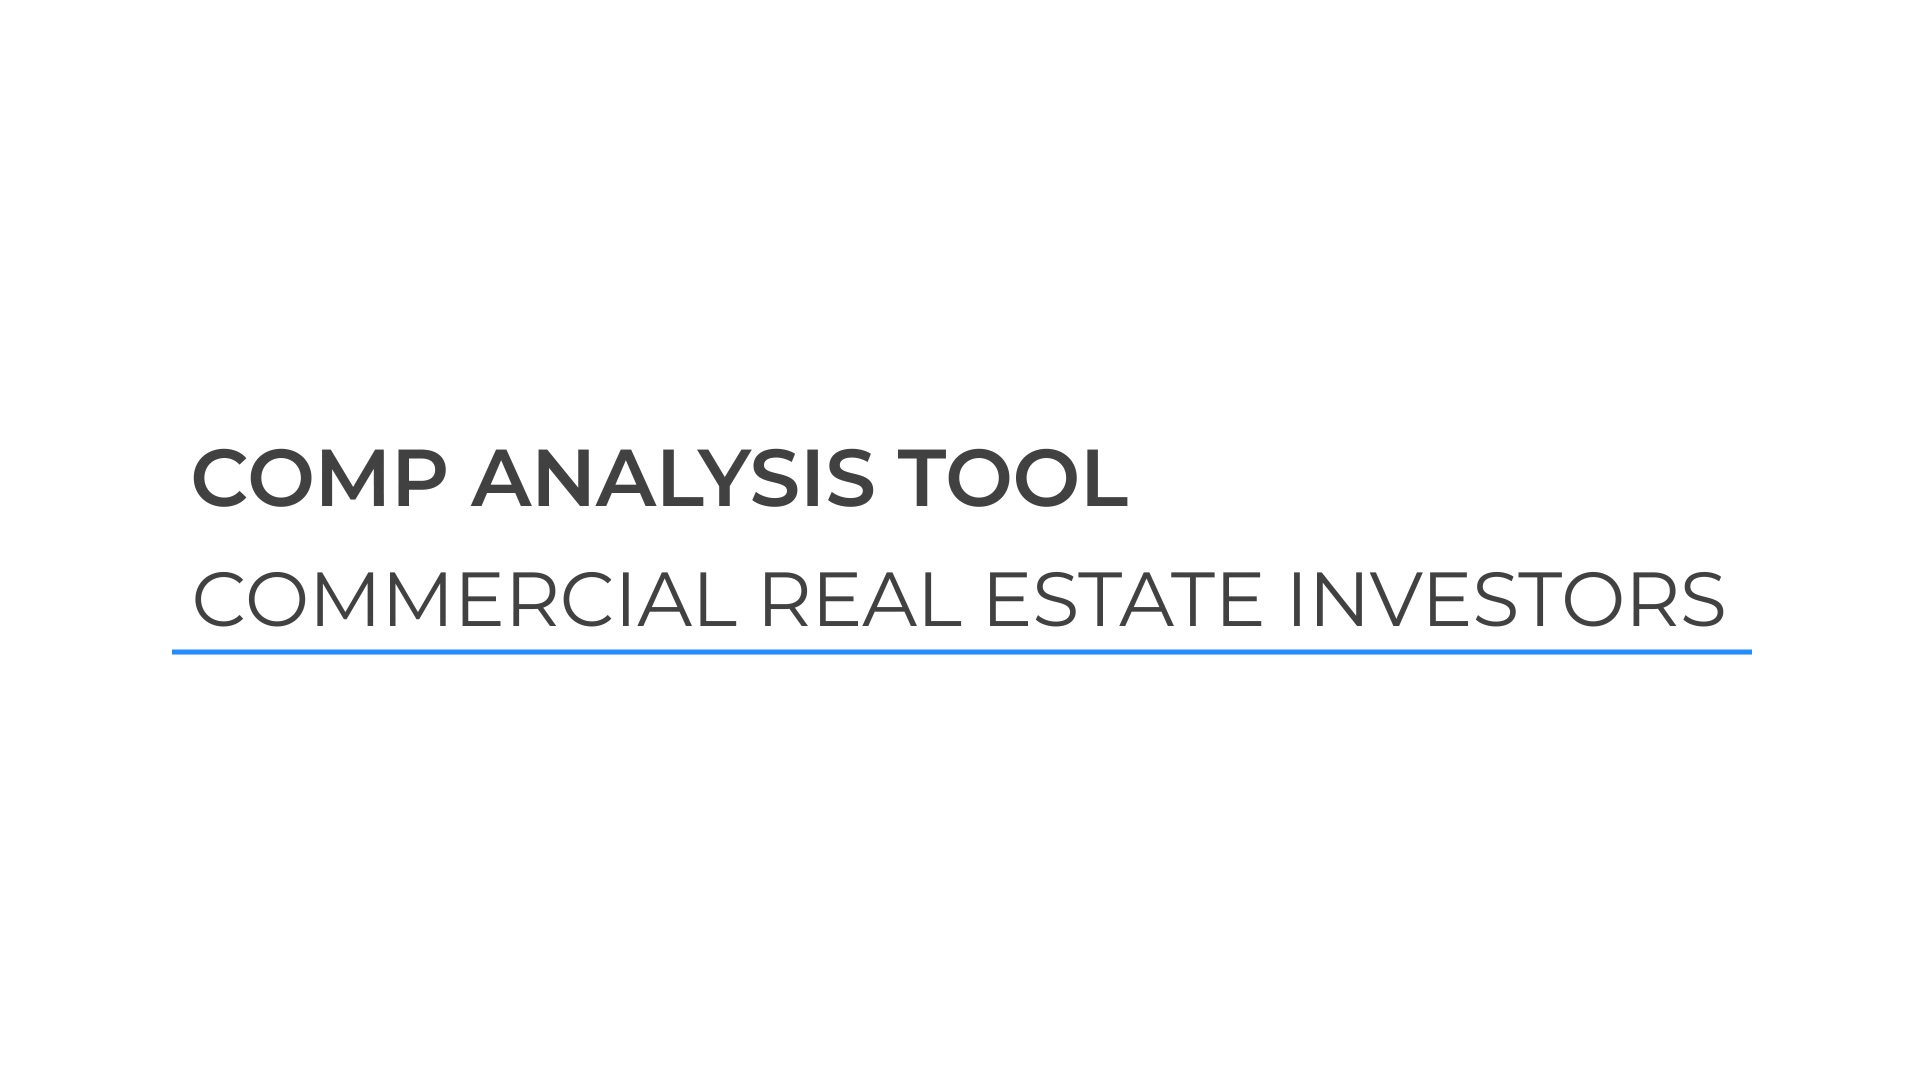 9._Commercial_Real_Estate_Investors_mjlpri